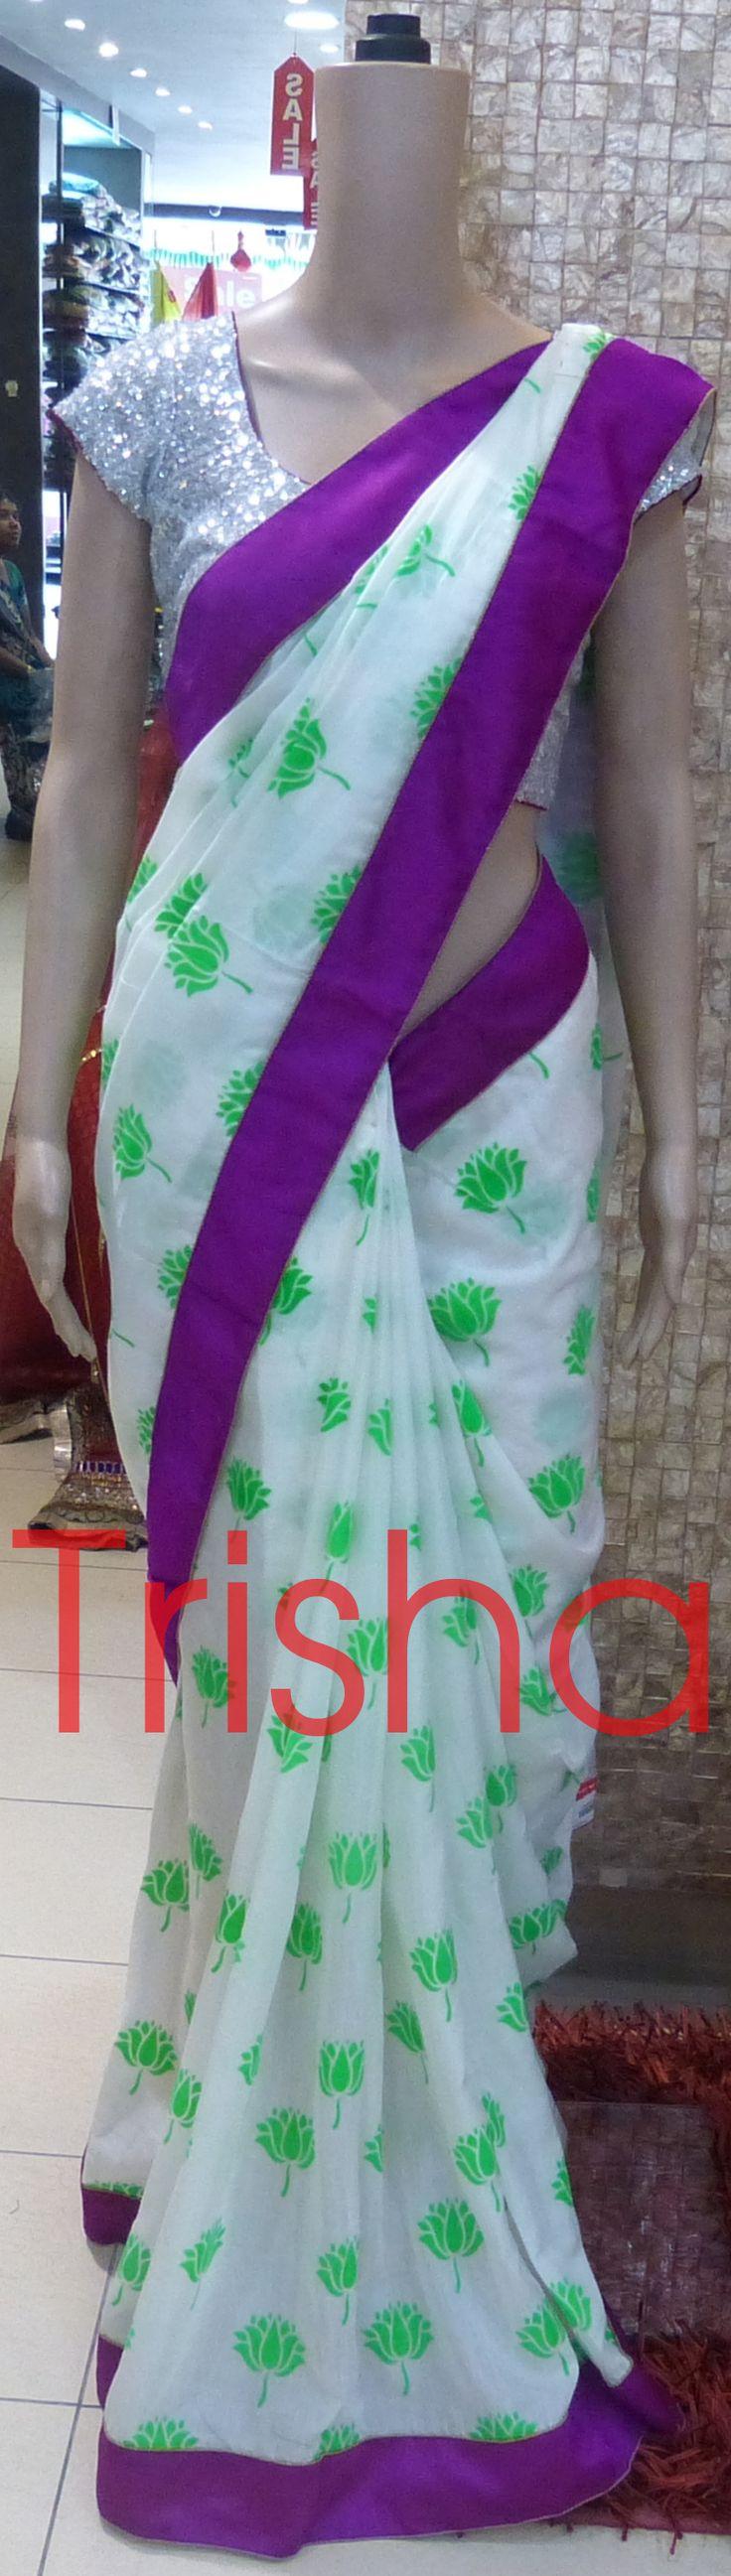 Handloom Silk Saree With Neon Print ,and Purple Raw-Silk Border